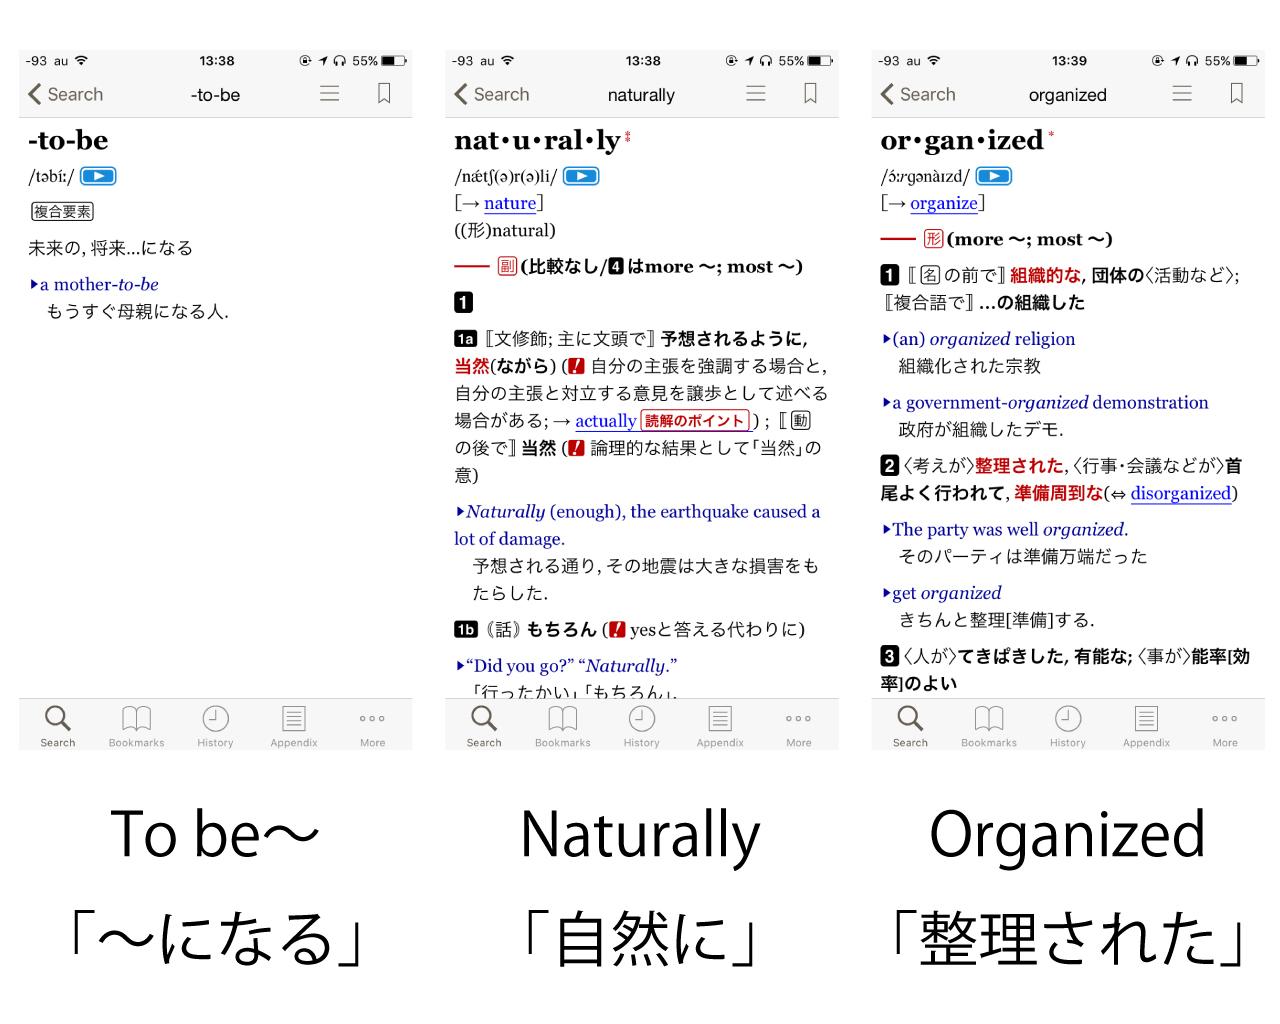 nozbe-origin-of-the-name-be-naturally-organaized-1